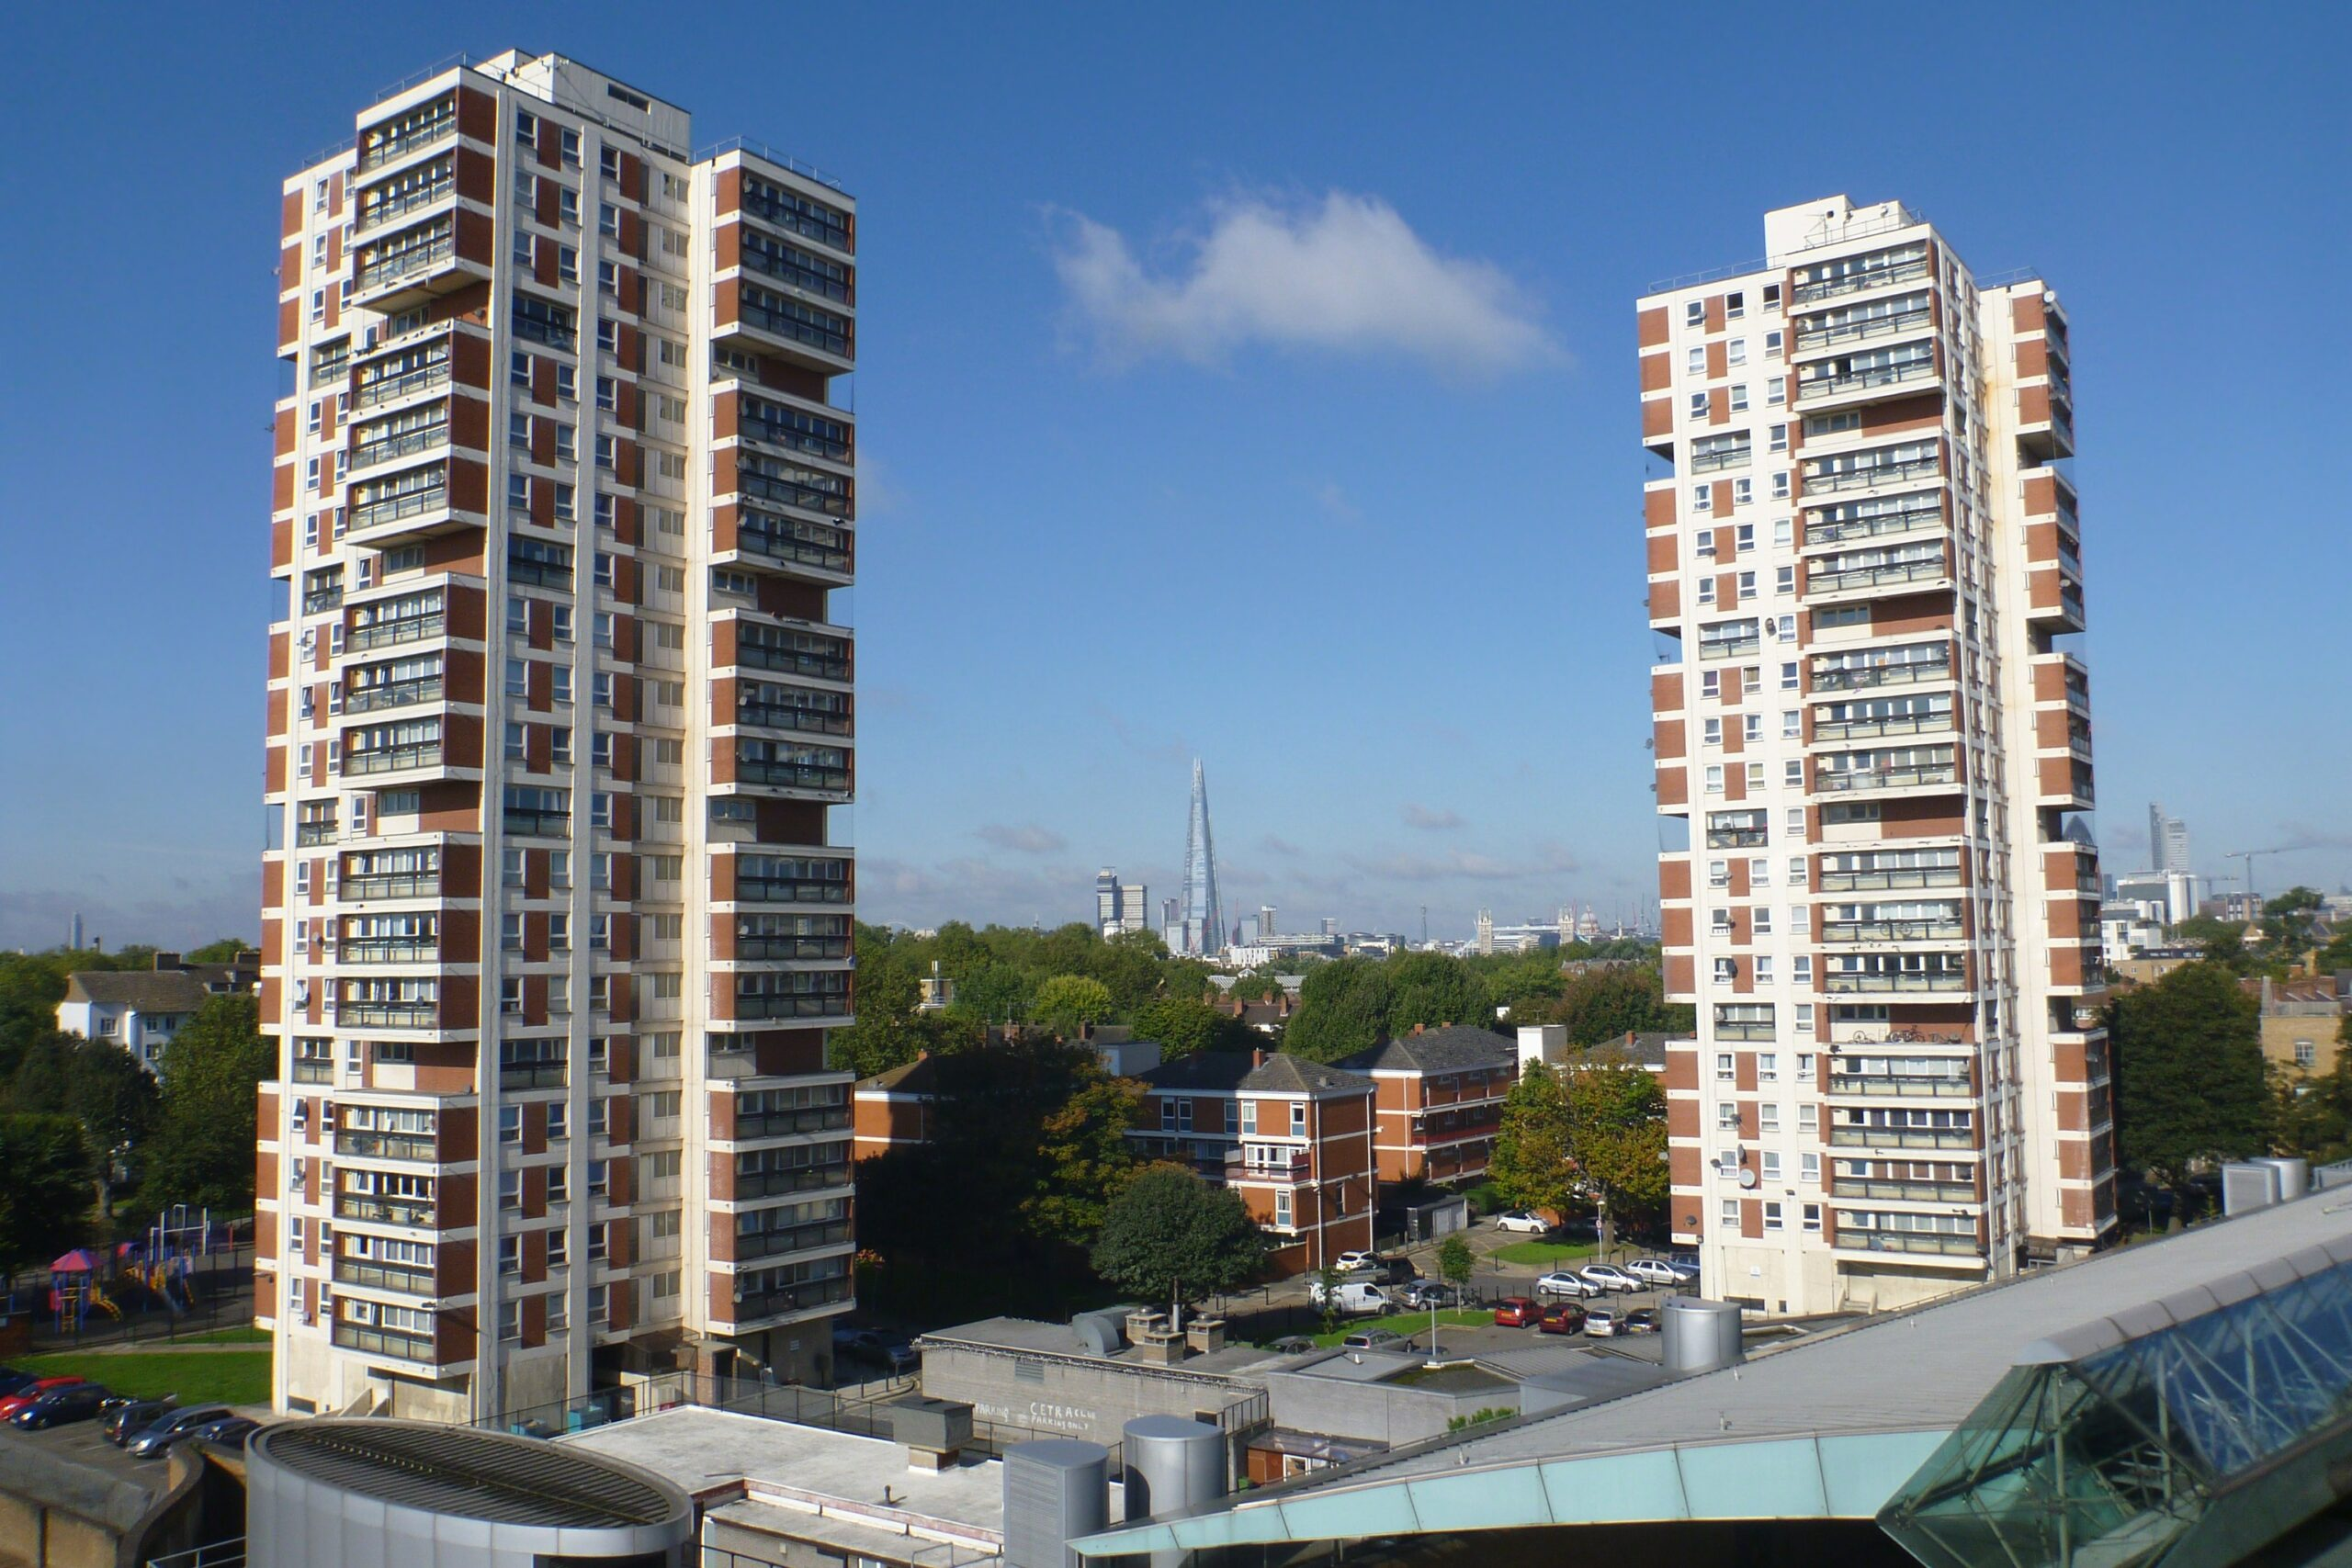 bairros-mais-baratos-de-Londres-canada-water